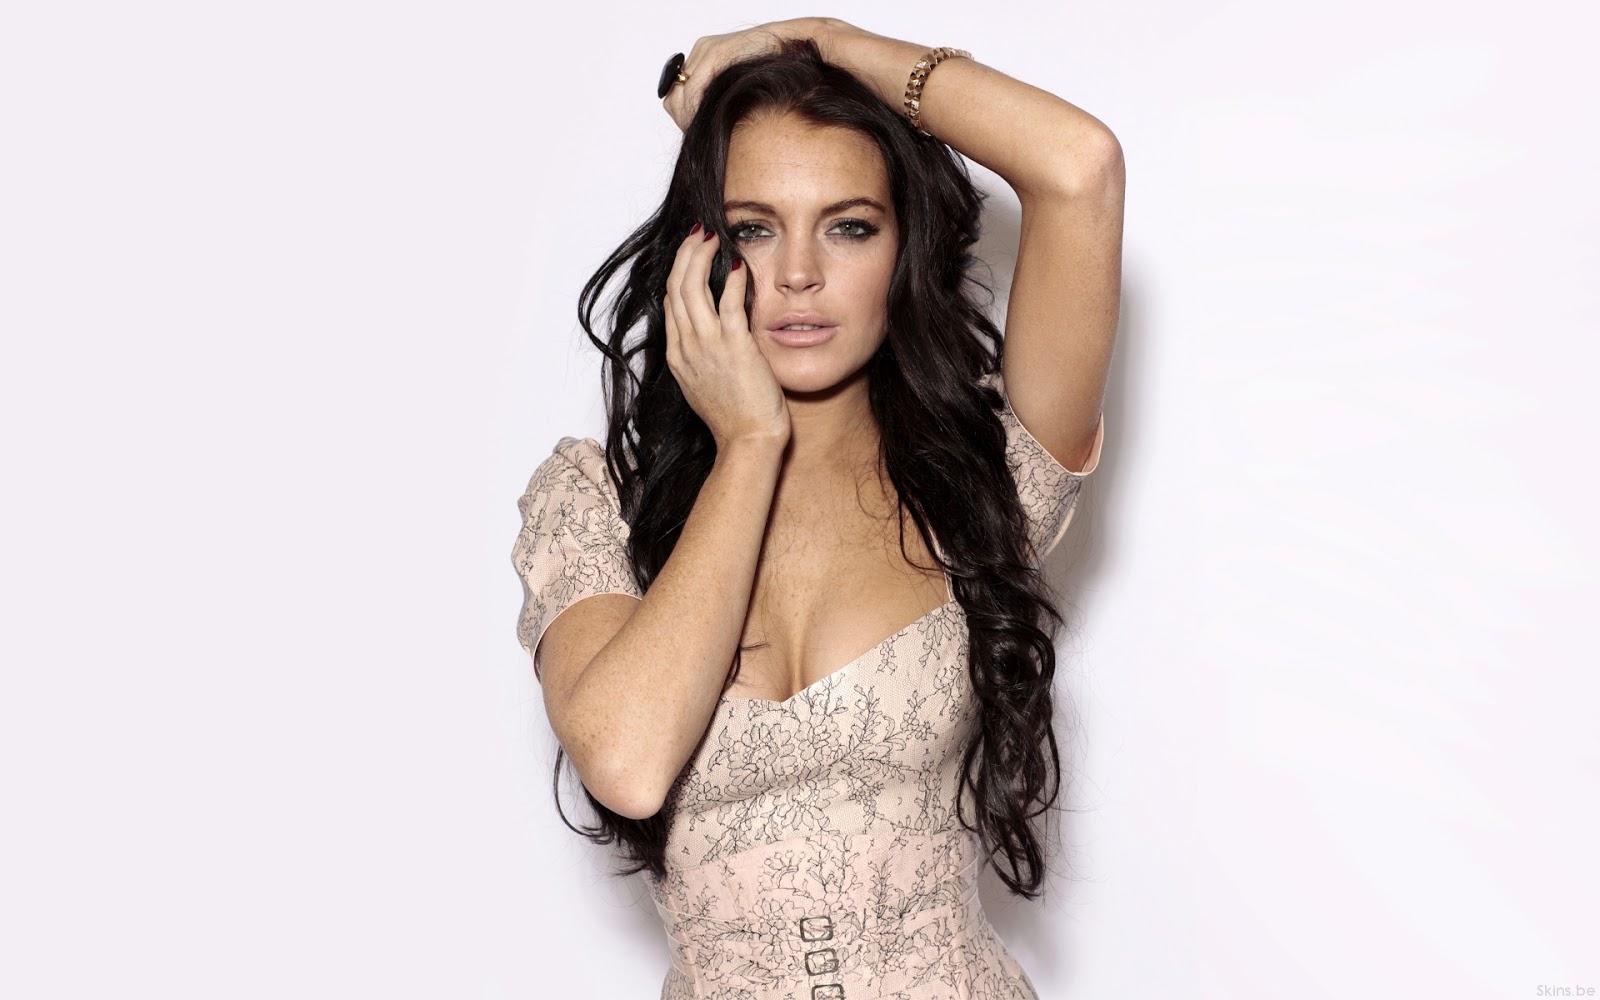 , Lindsay Lohan hot photos, Lindsay Lohan hd pics, Lindsay Lohan